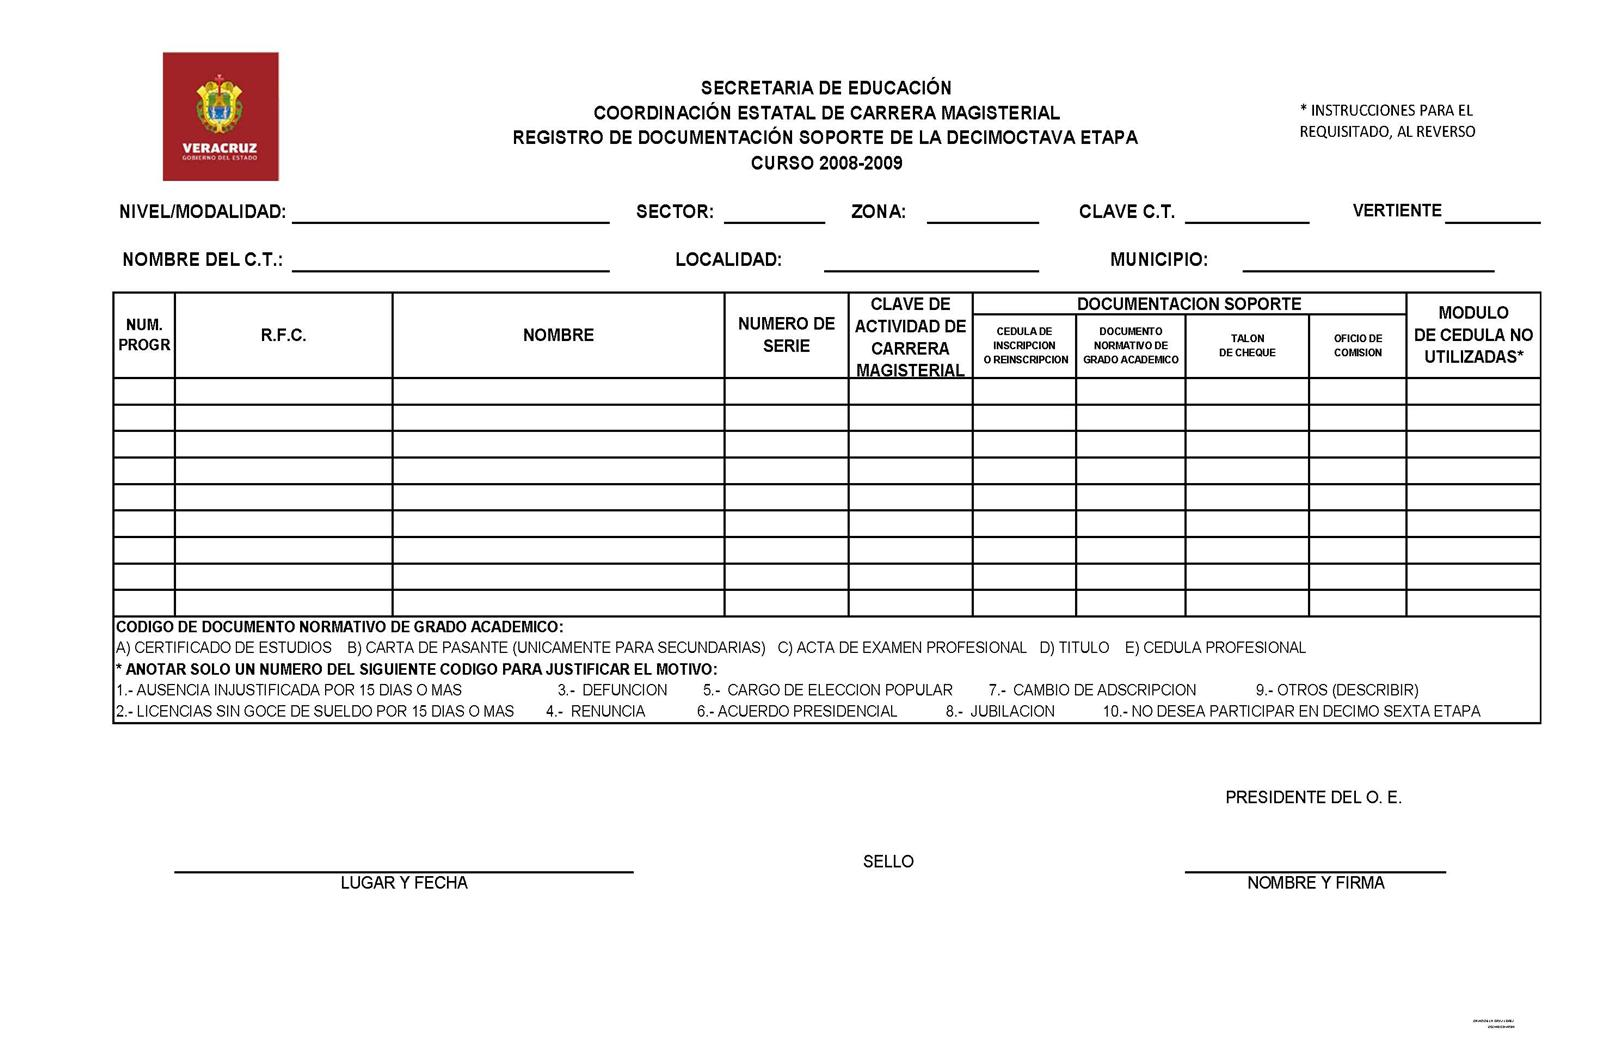 Inscripciones Primaria Secundaria Preescolar Said Sep | Share The ...